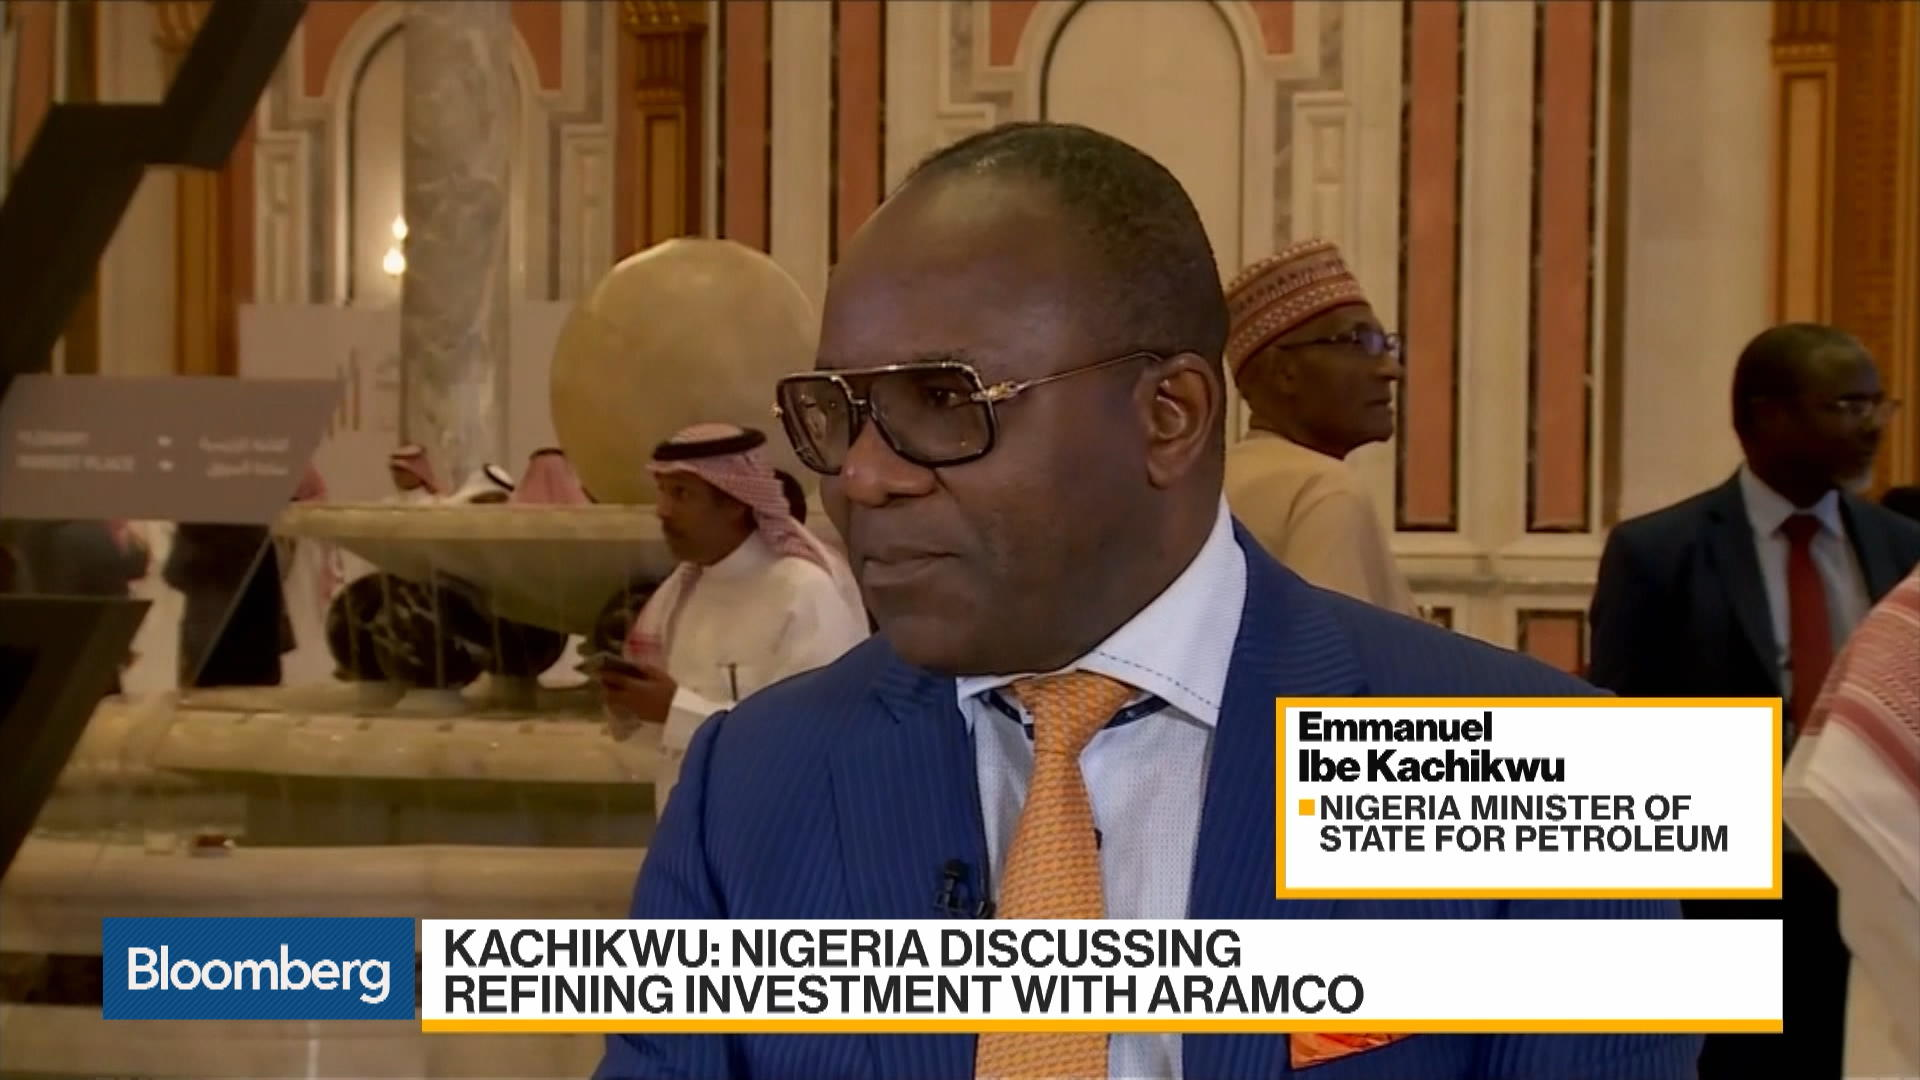 Nigeria, Aramco Discussing Refining Investment: Kachikwu